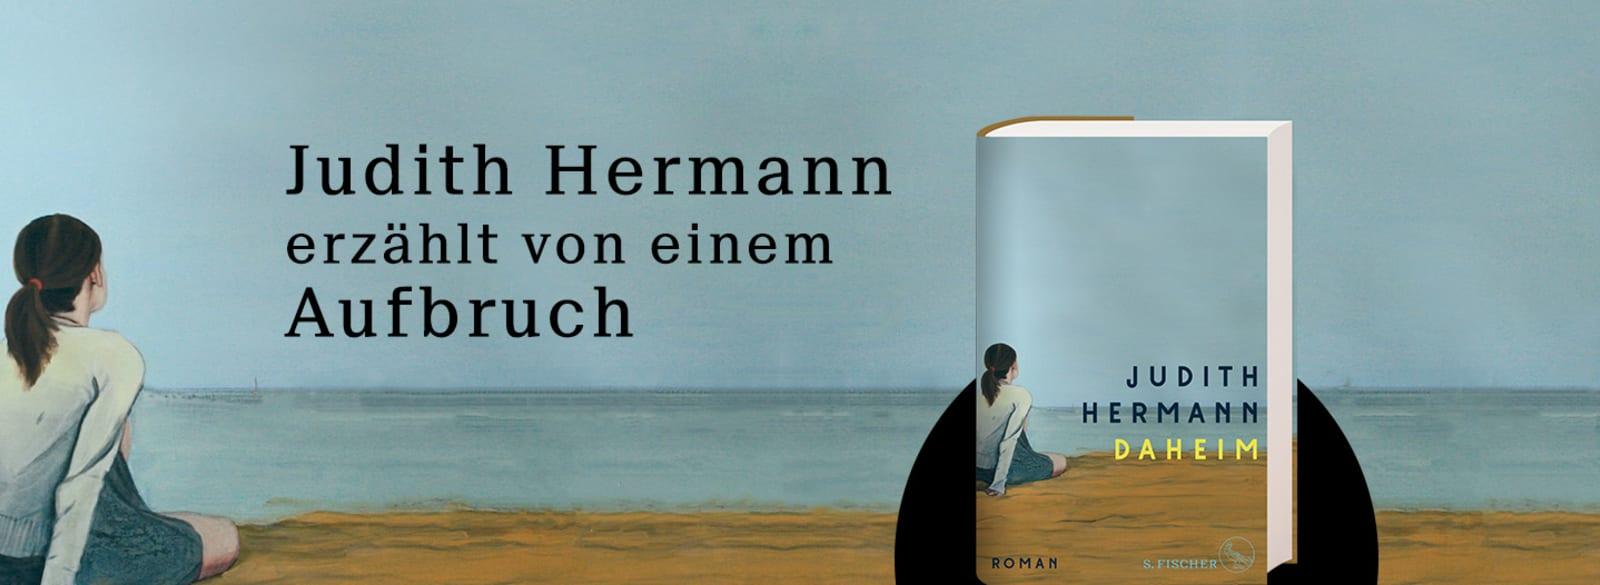 Judith Hermann Daheim HC